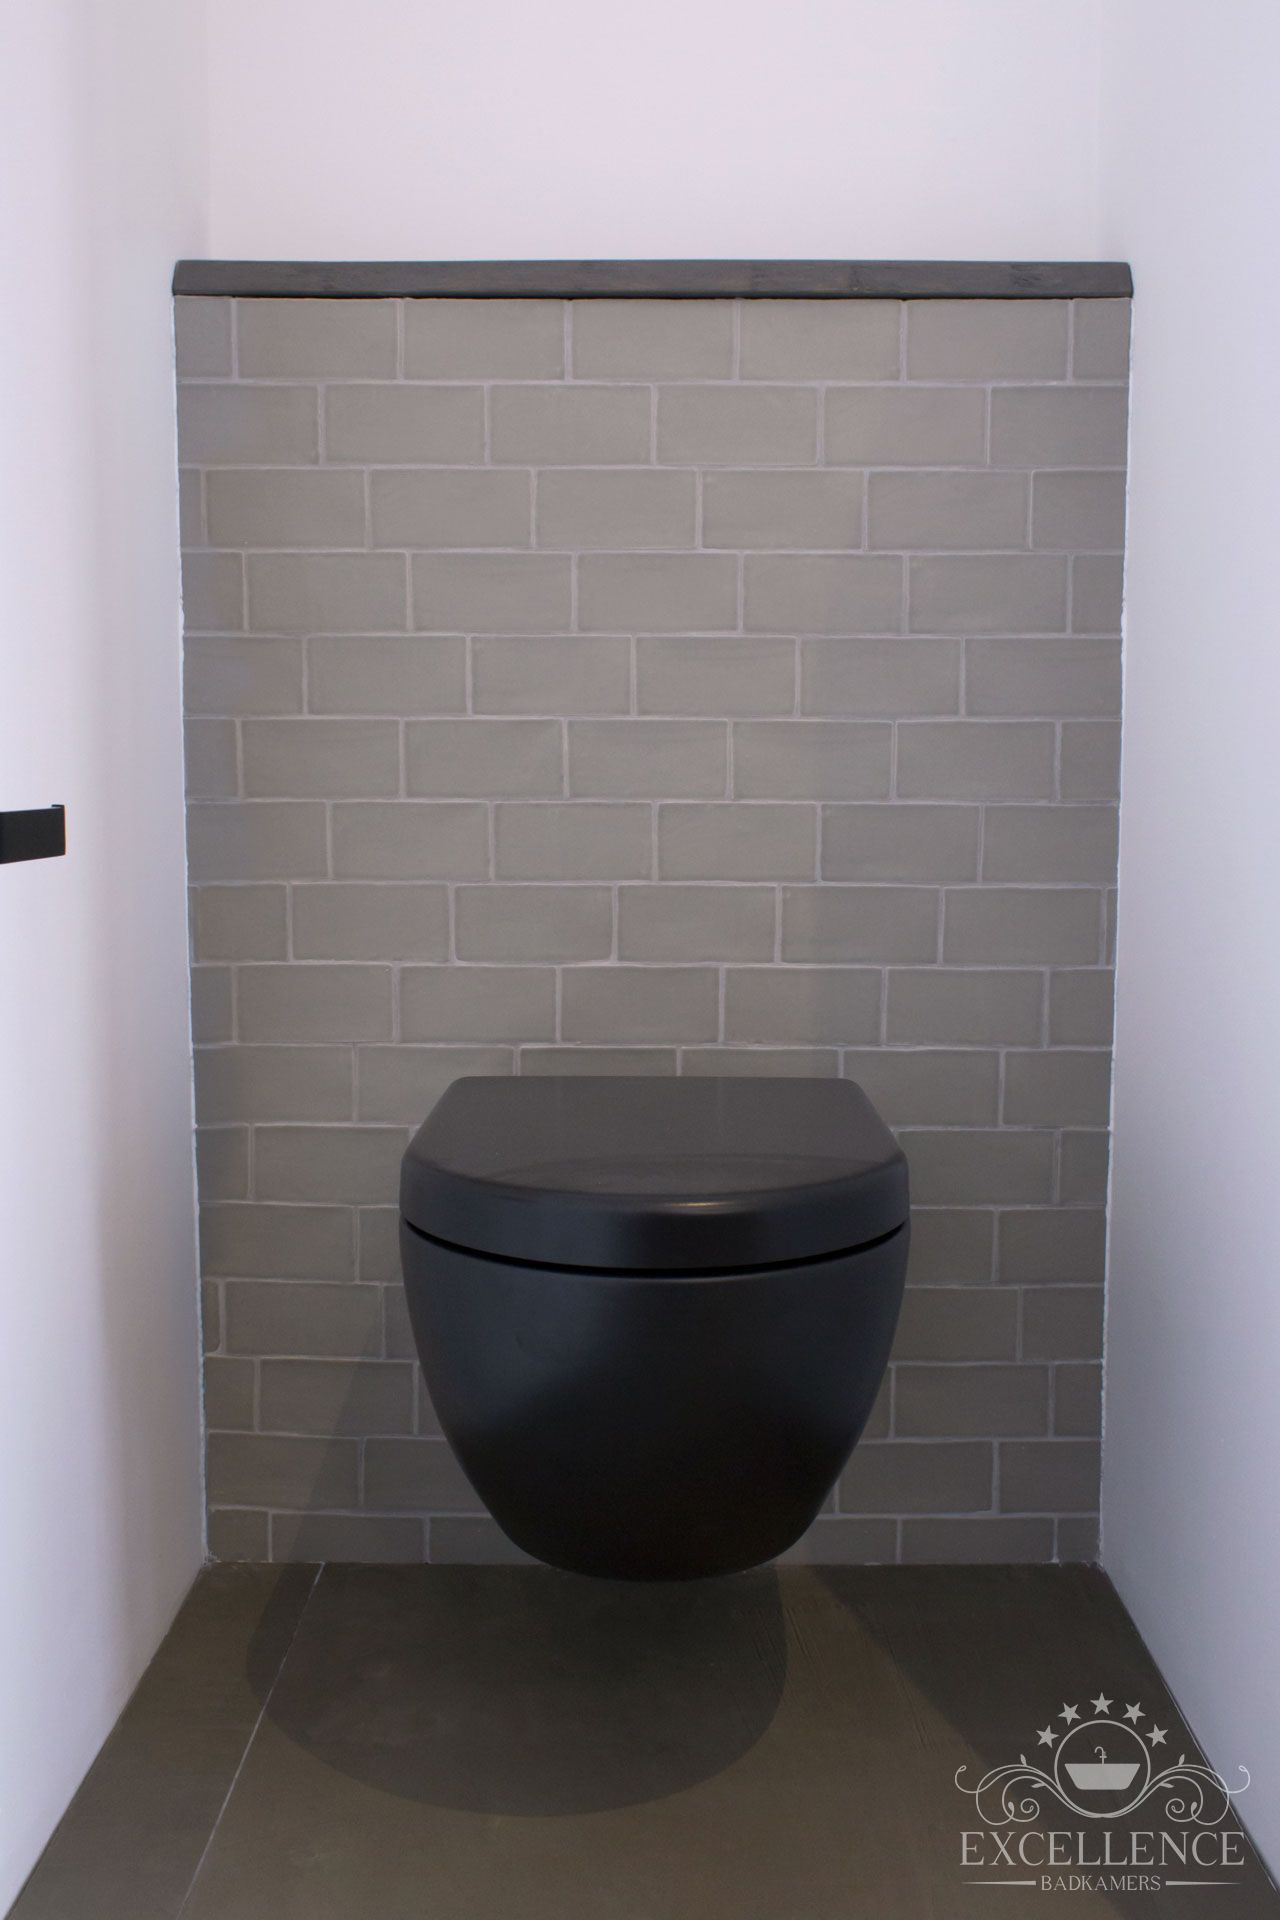 Maatwerk badkamer. Design wandcloset mat zwart. #excellencebadkamers ...